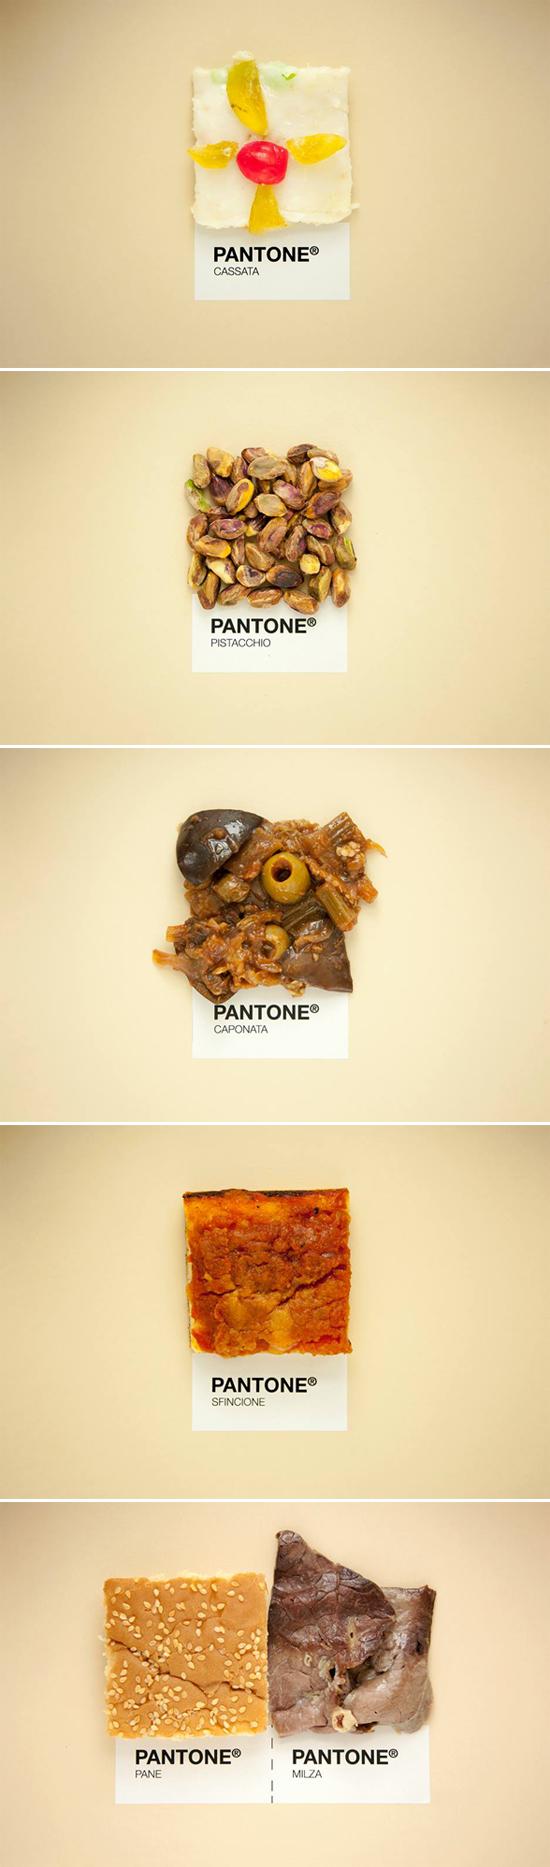 pantone_food_sicilian